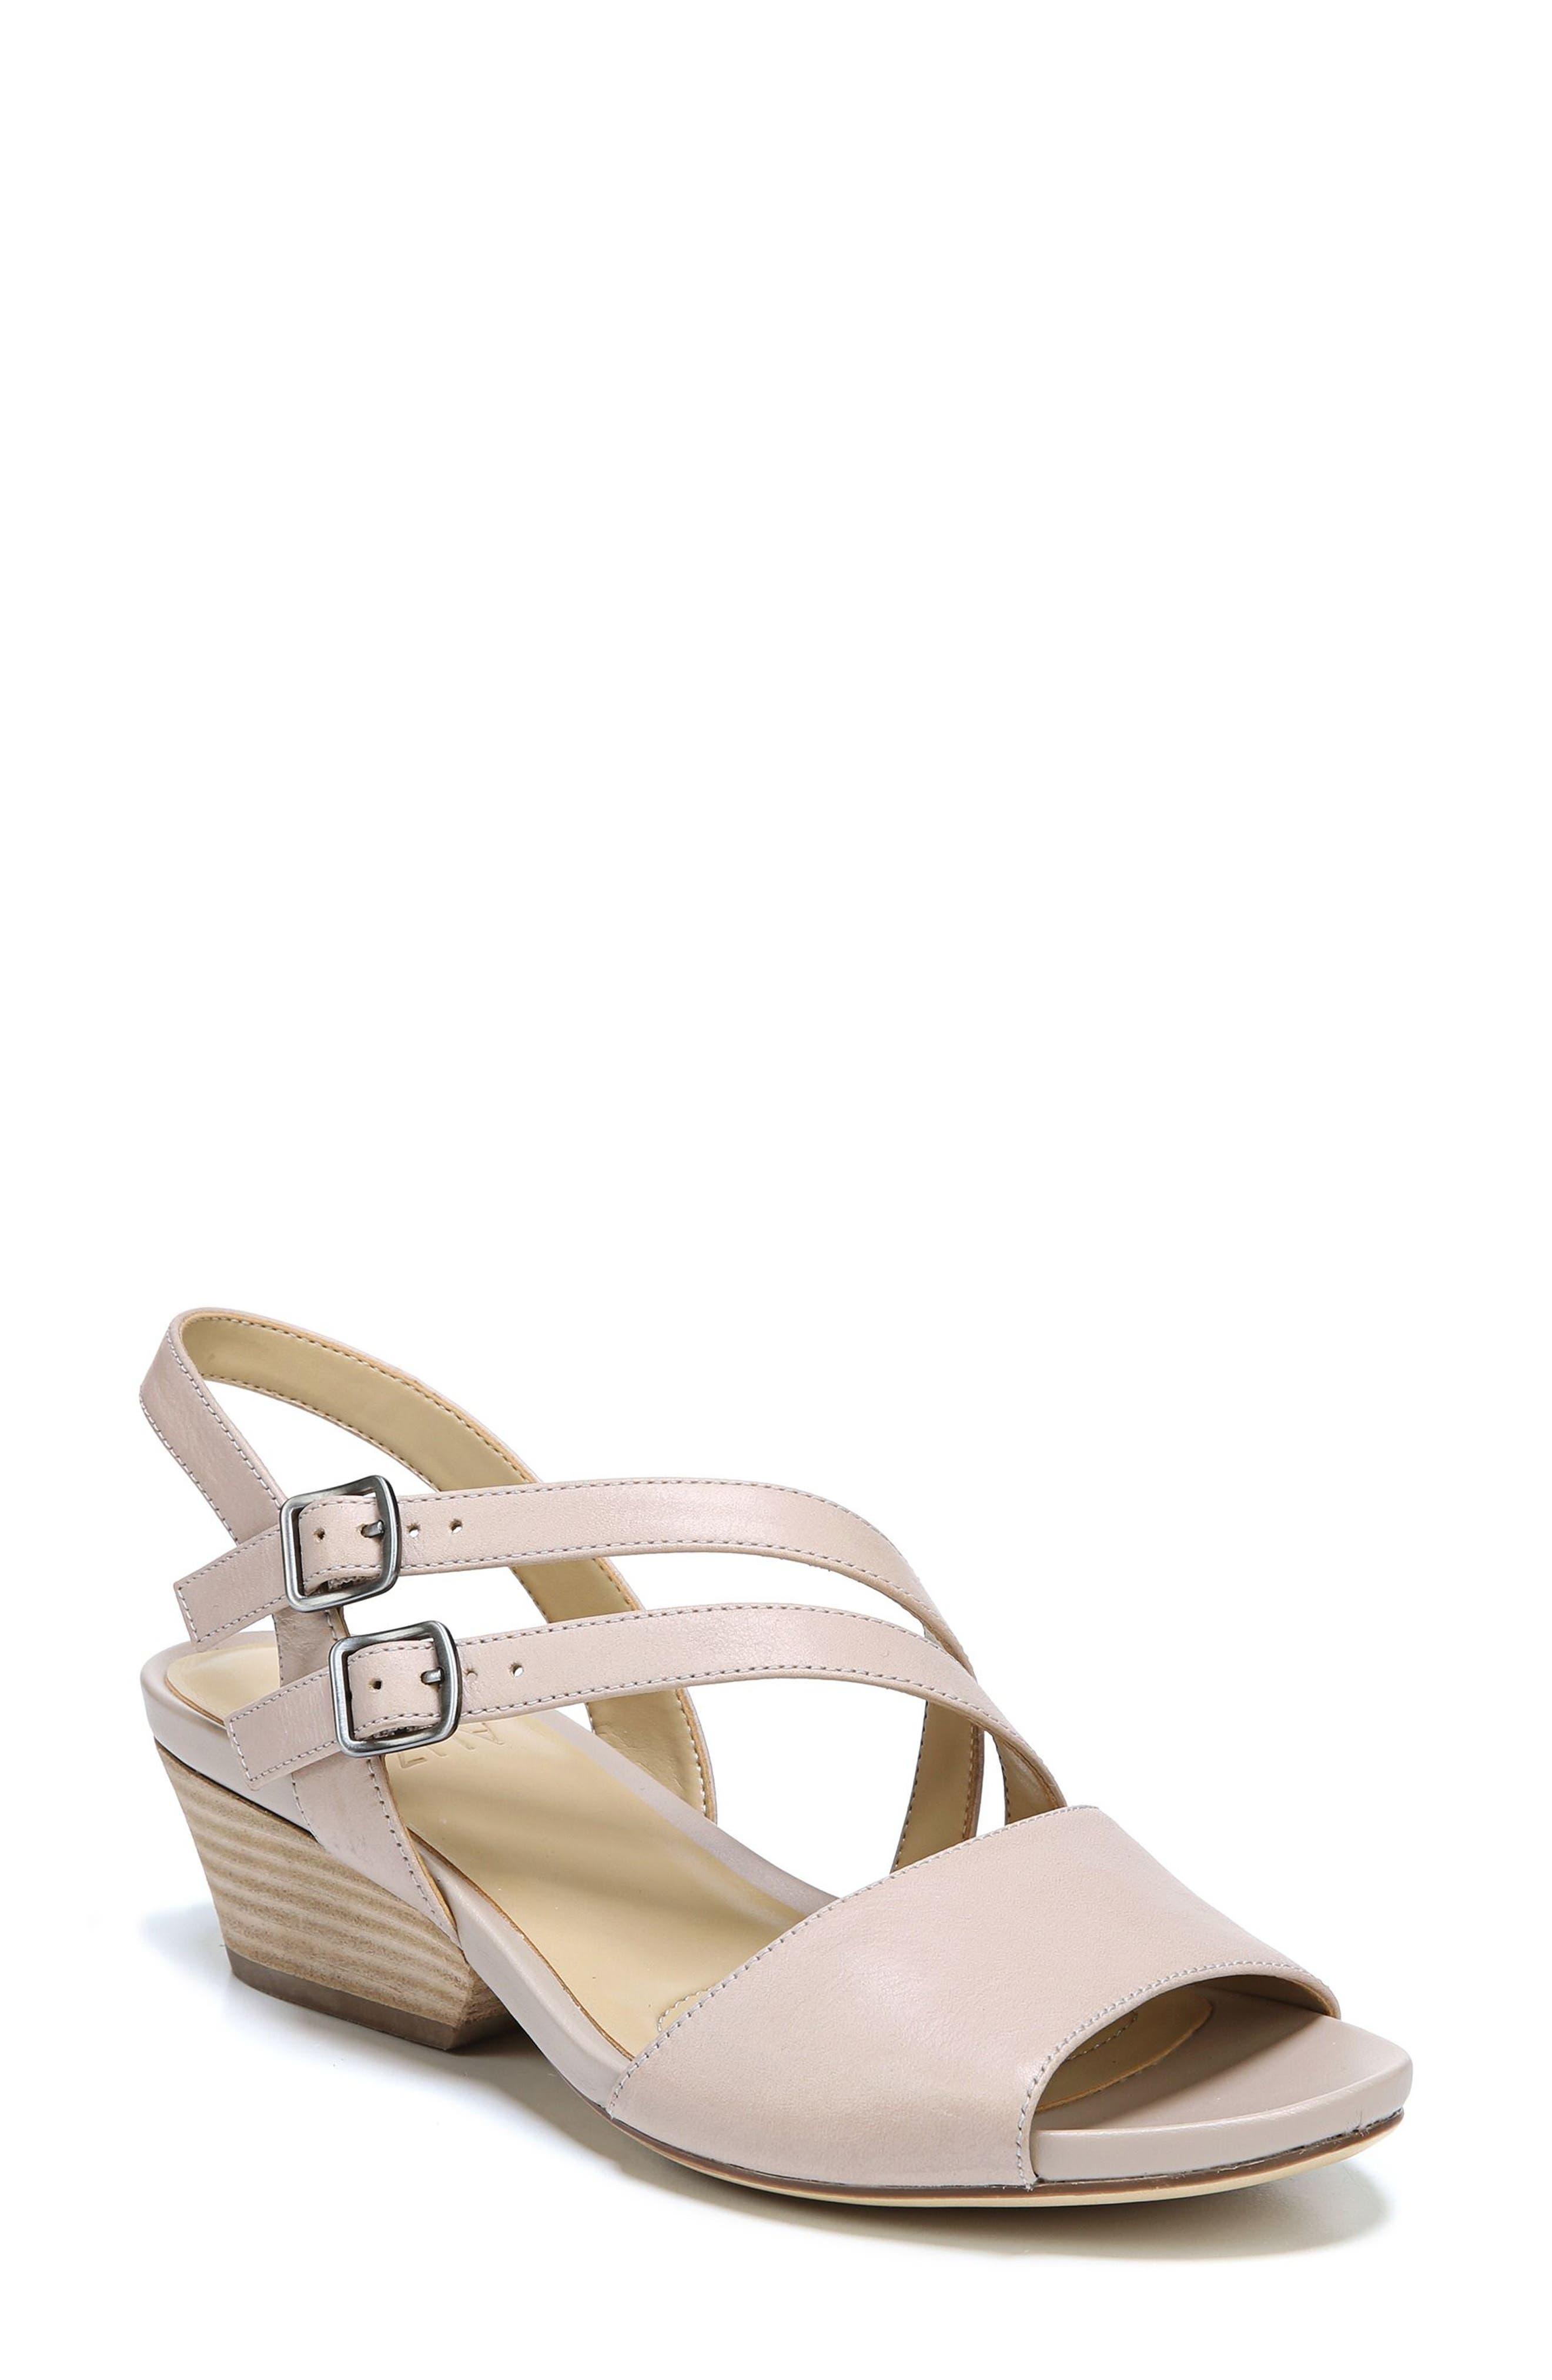 Gigi Sandal,                         Main,                         color, Soft Marble Leather